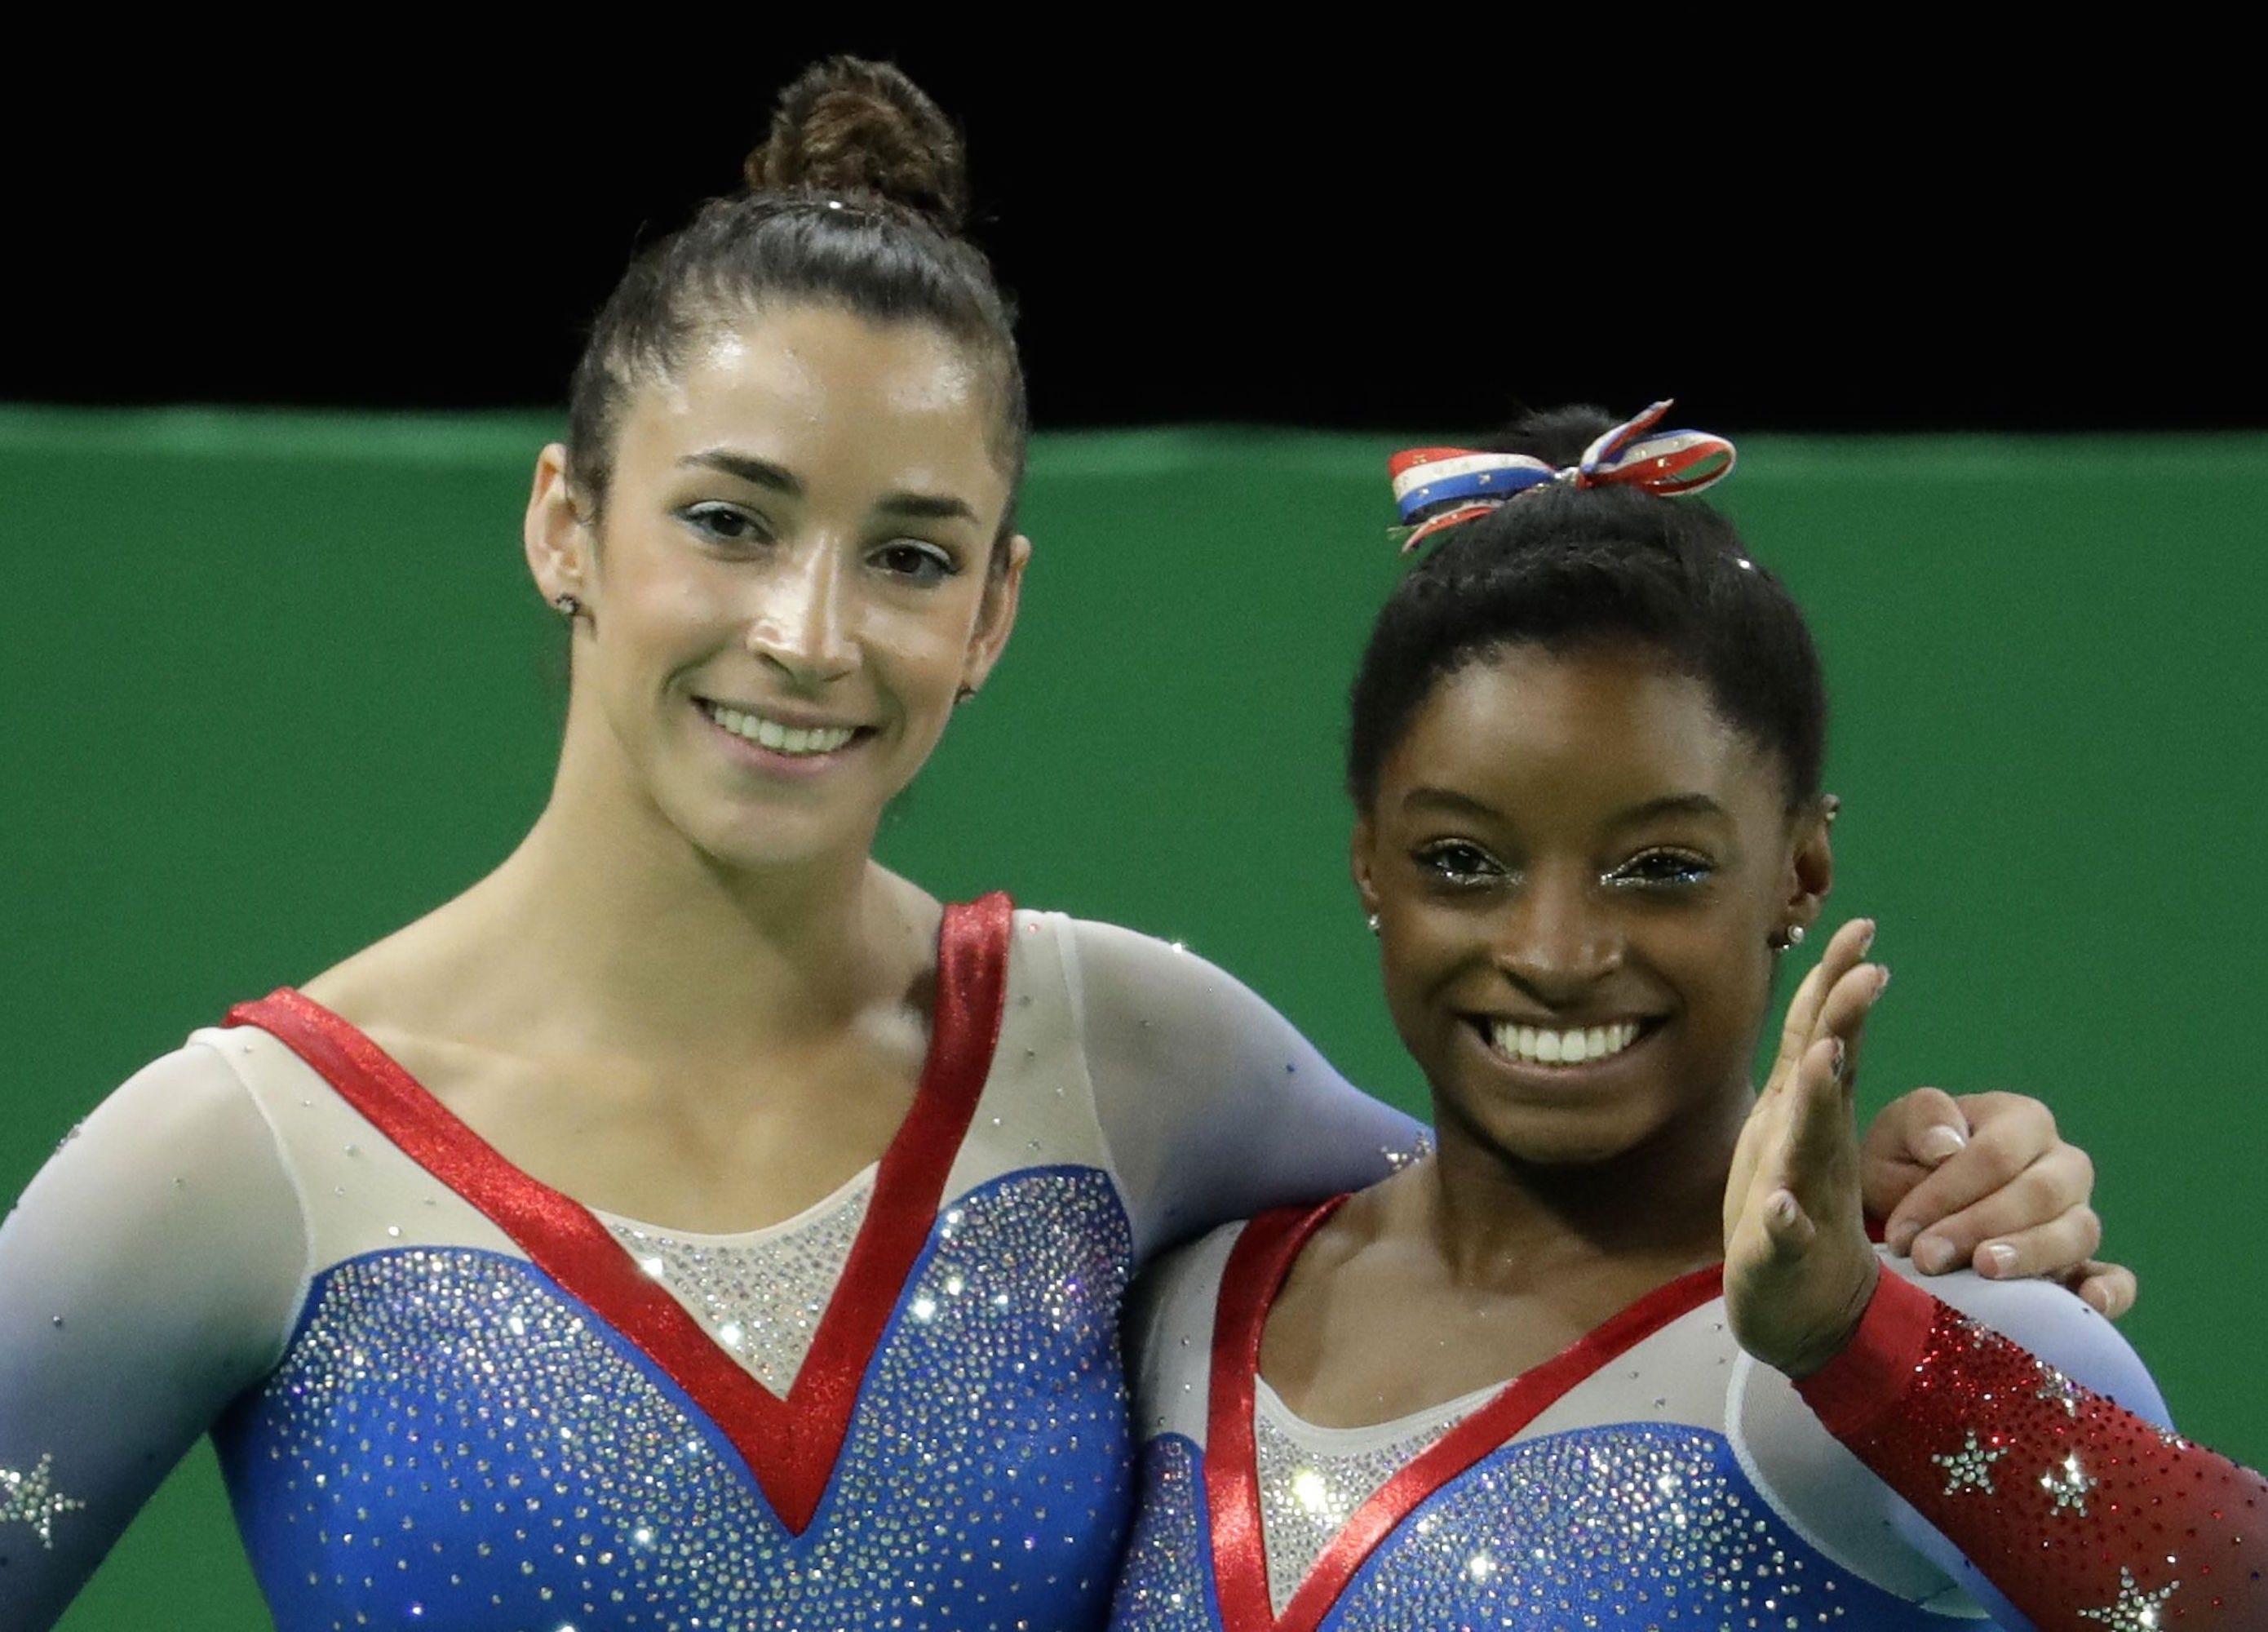 How Simone Biles & Aly Raisman Celebrated Their Olympic Victories